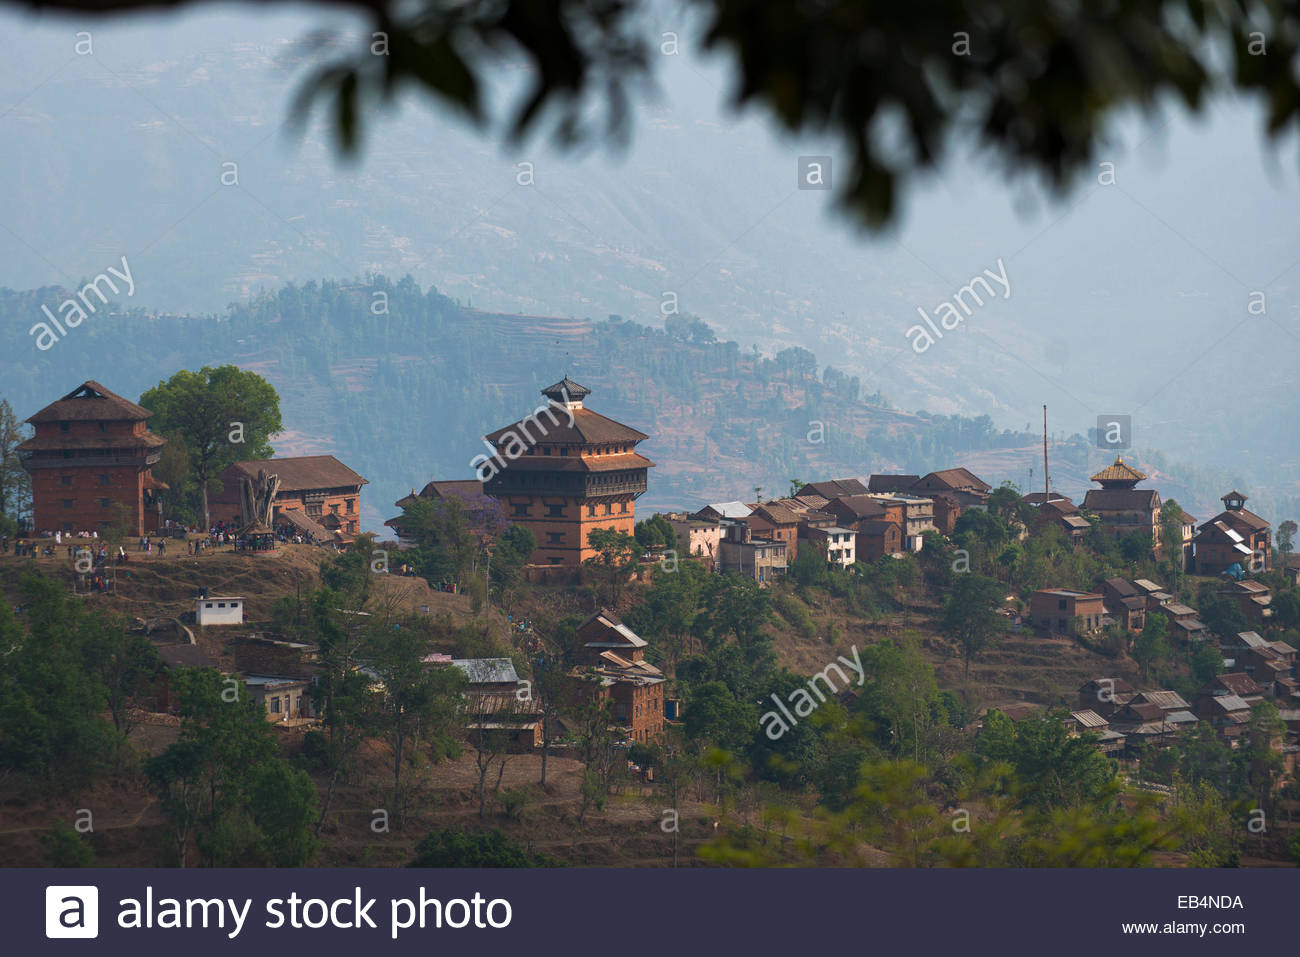 The historical Newari village of Nuwakot in Nepal - Stock Image